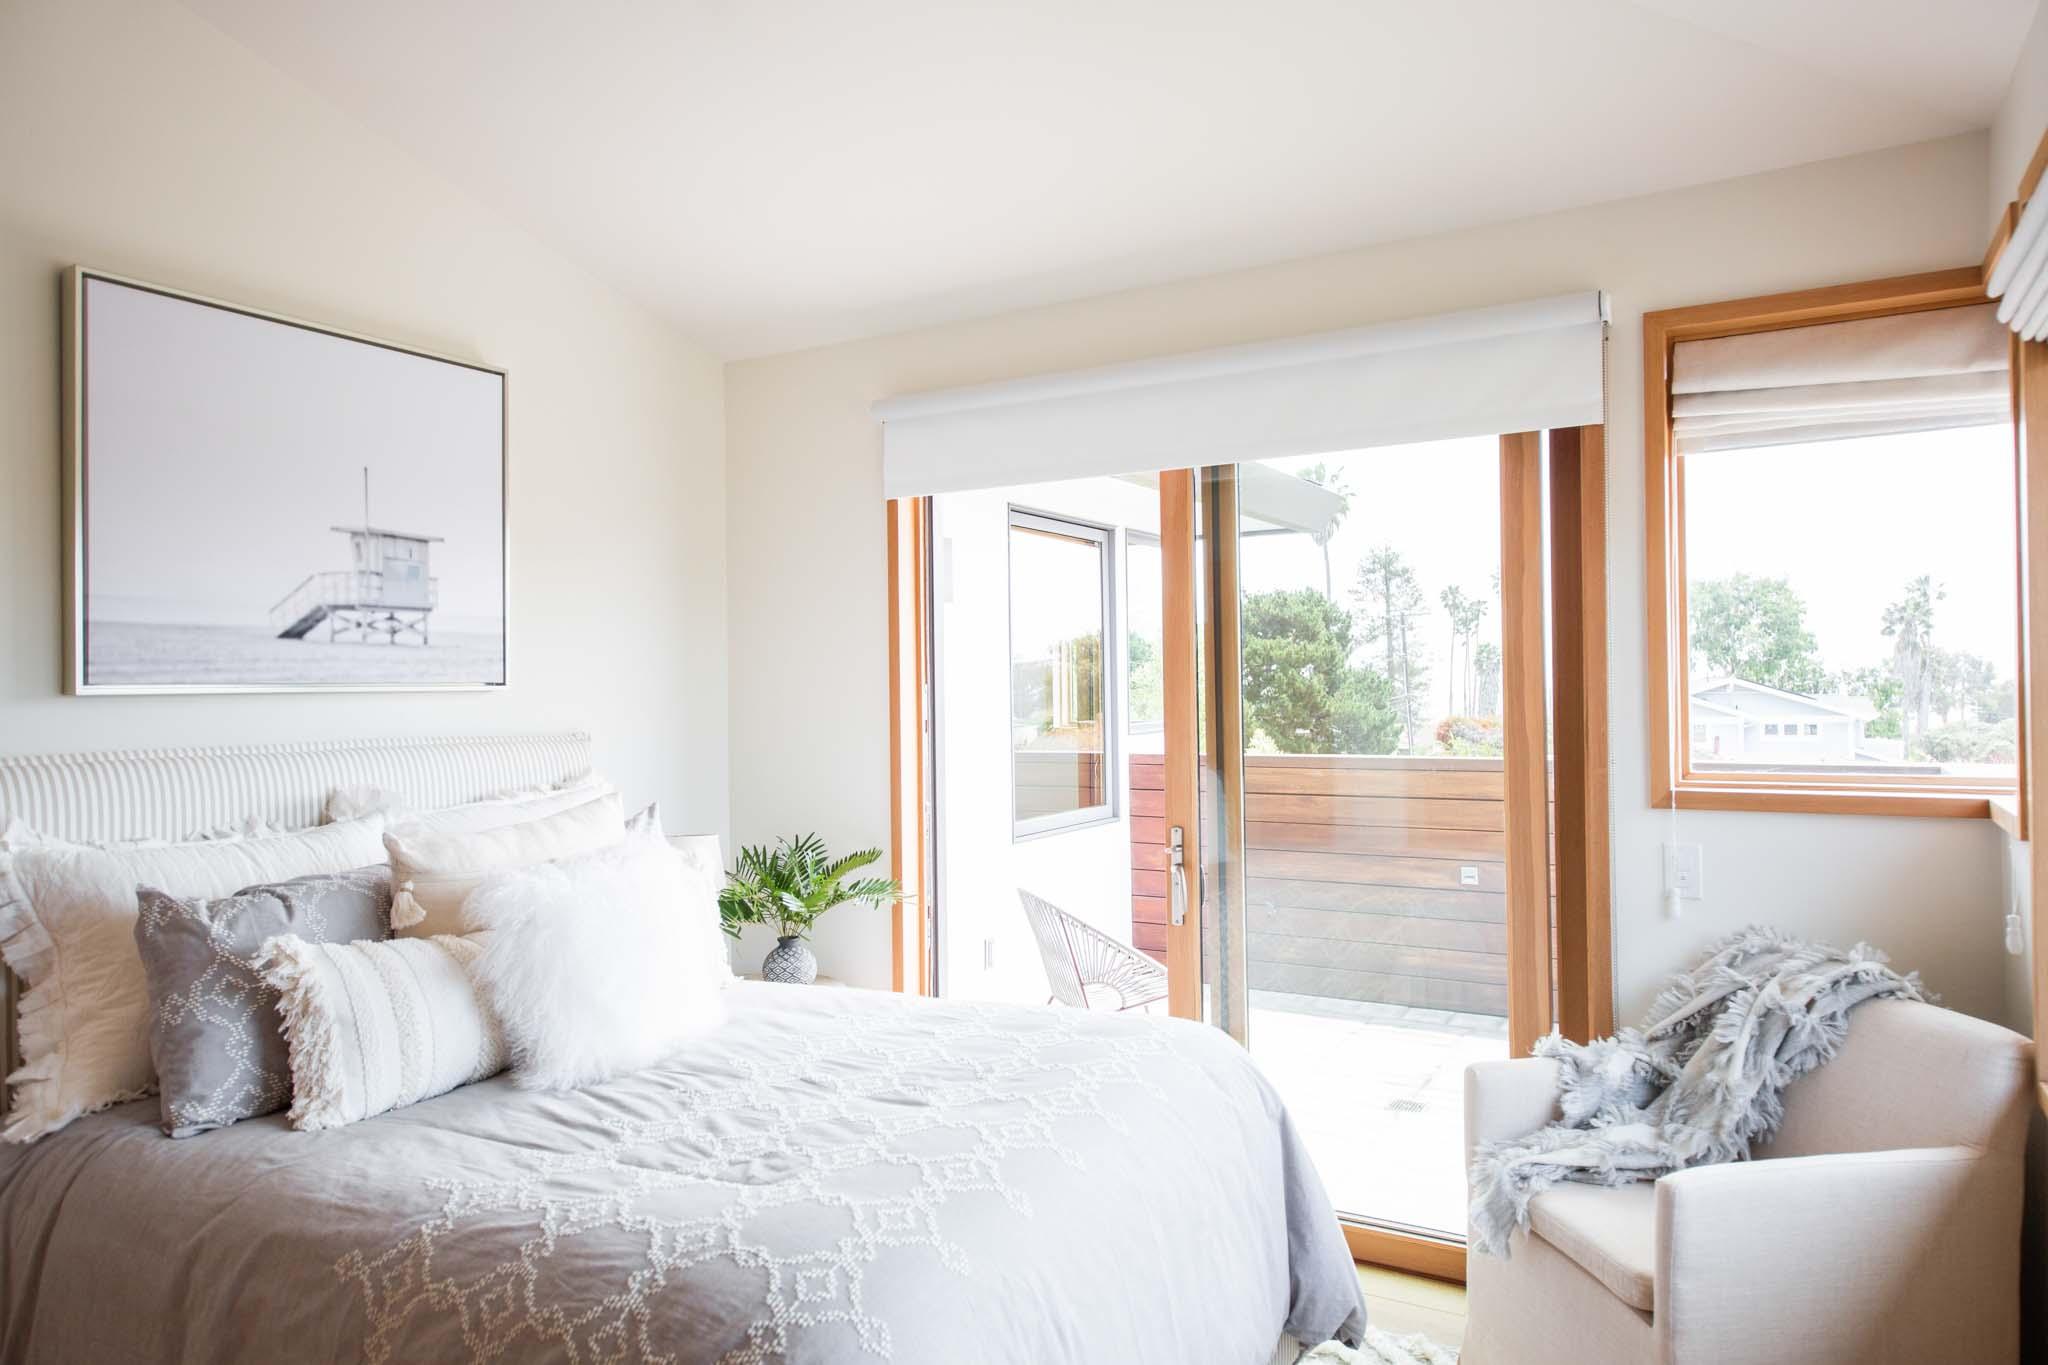 Jodi G Designs | Santa Barbara Interior Design Lanscape -22.jpg